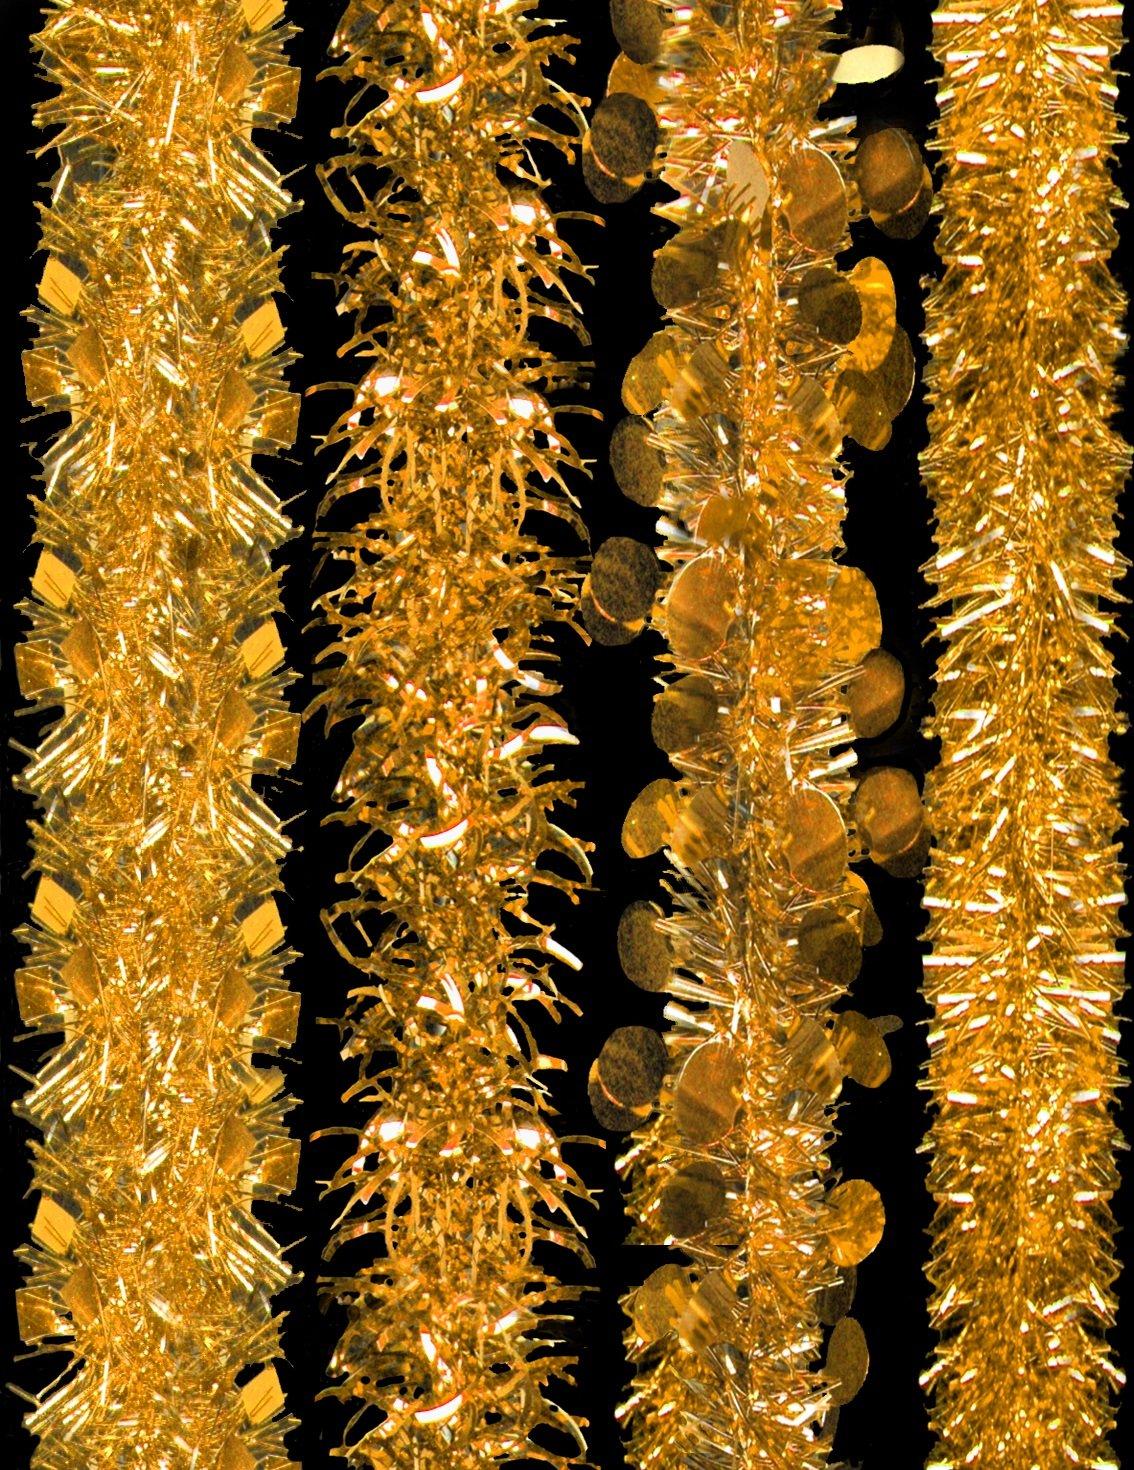 2 Metre Gold Tinsel - Decorated Christmas Tinsel - 4 Designs - 1 Chosen At Random. Christmas Shop